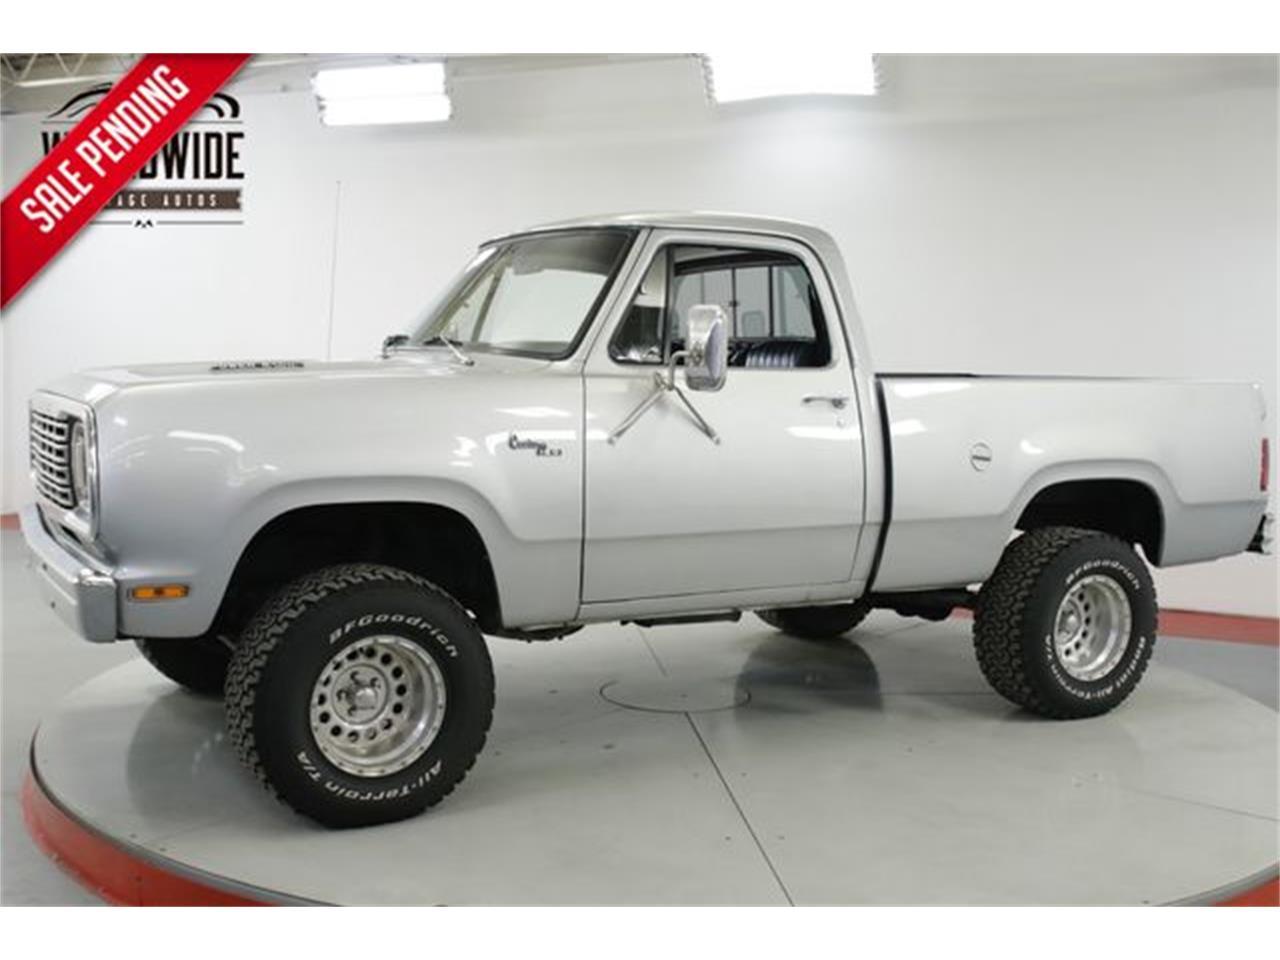 1978 Dodge Power Wagon For Sale Classiccars Com Cc 1211970